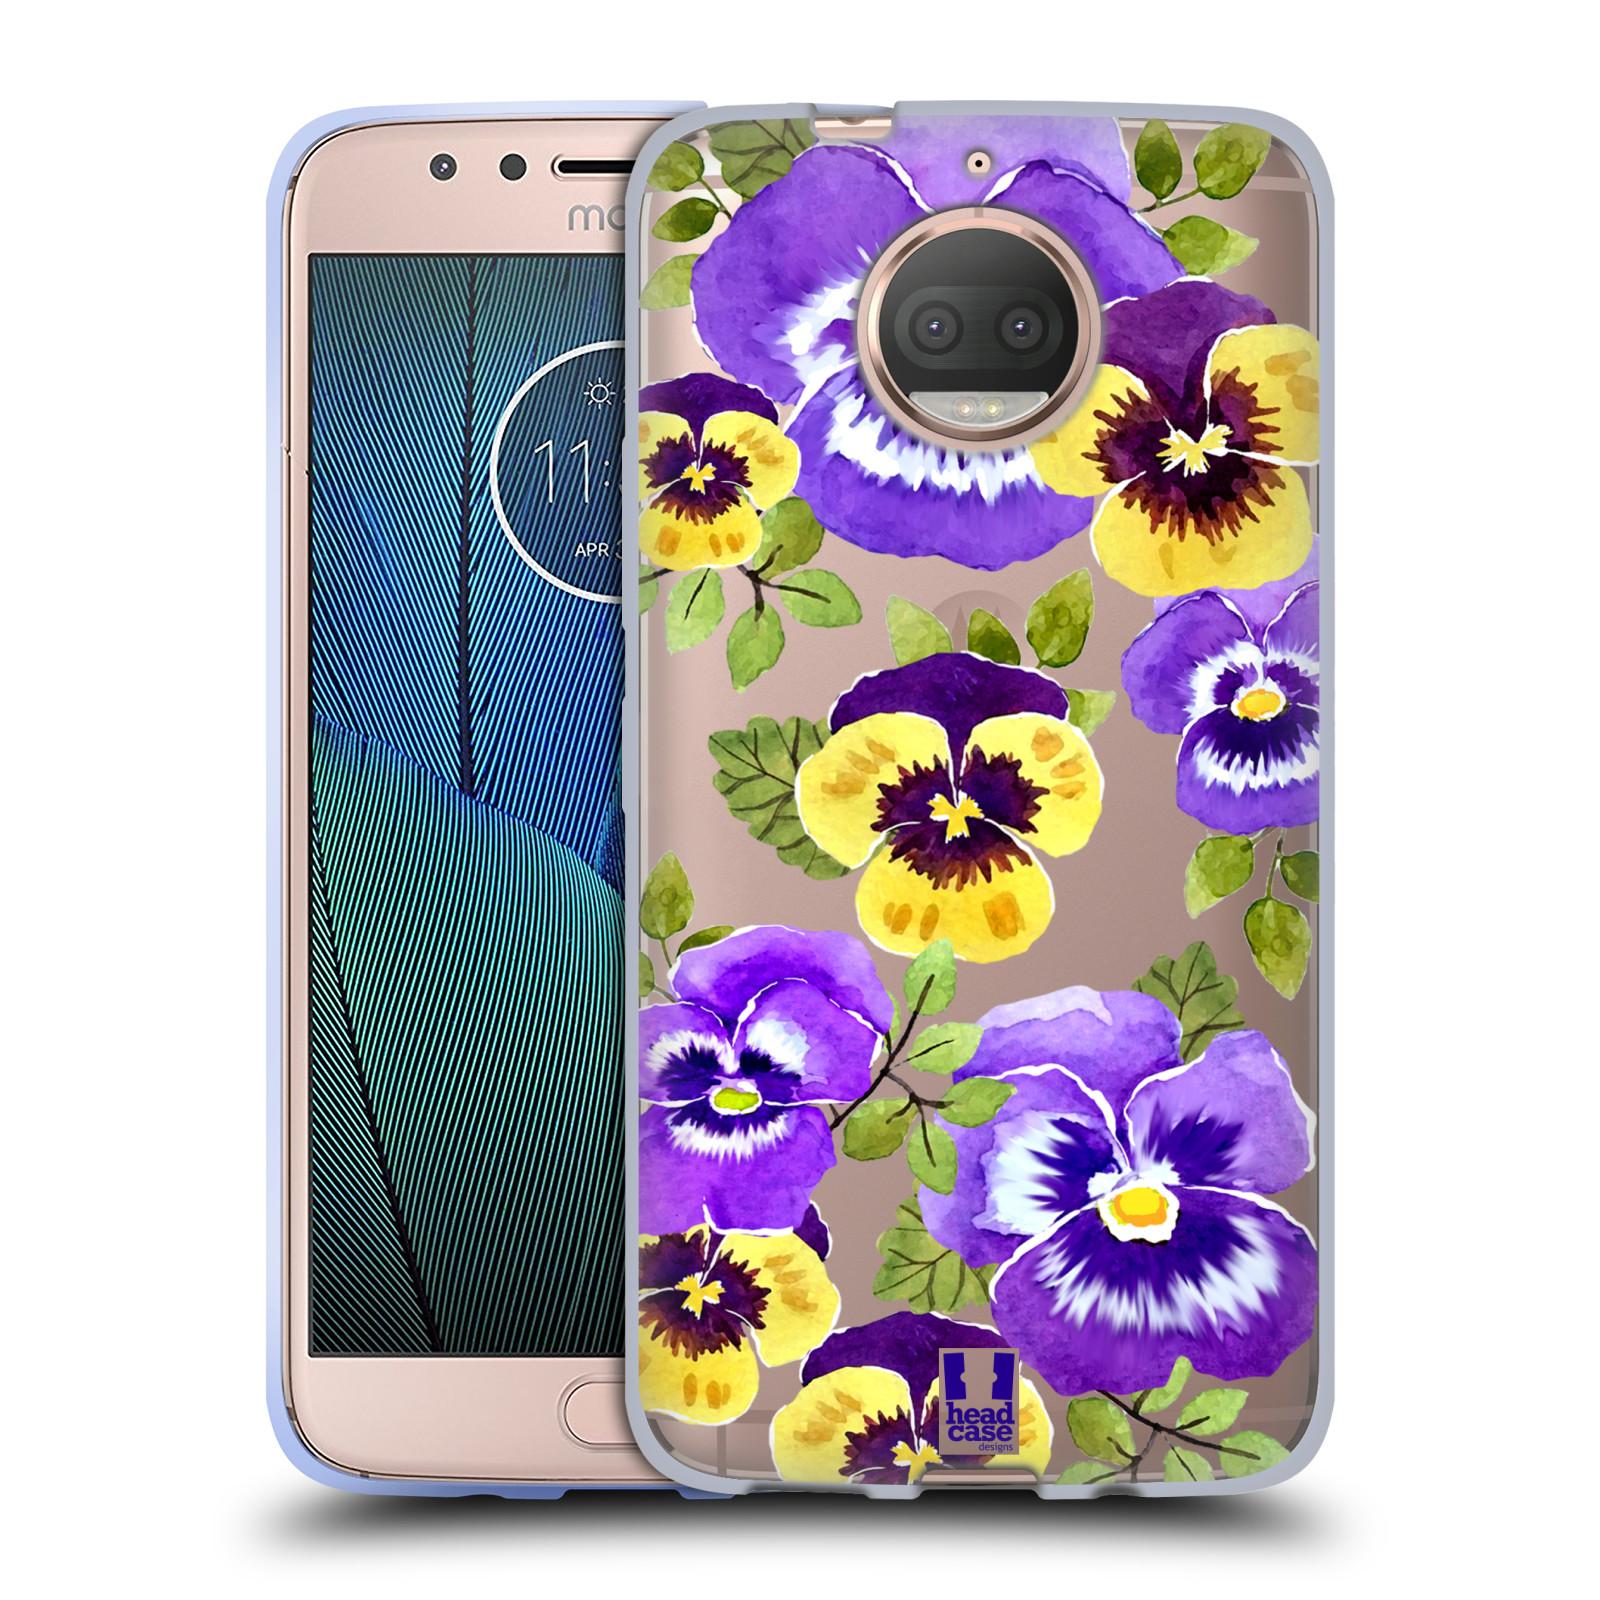 HEAD CASE silikonový obal na mobil Lenovo Moto G5s PLUS Maceška fialová barva